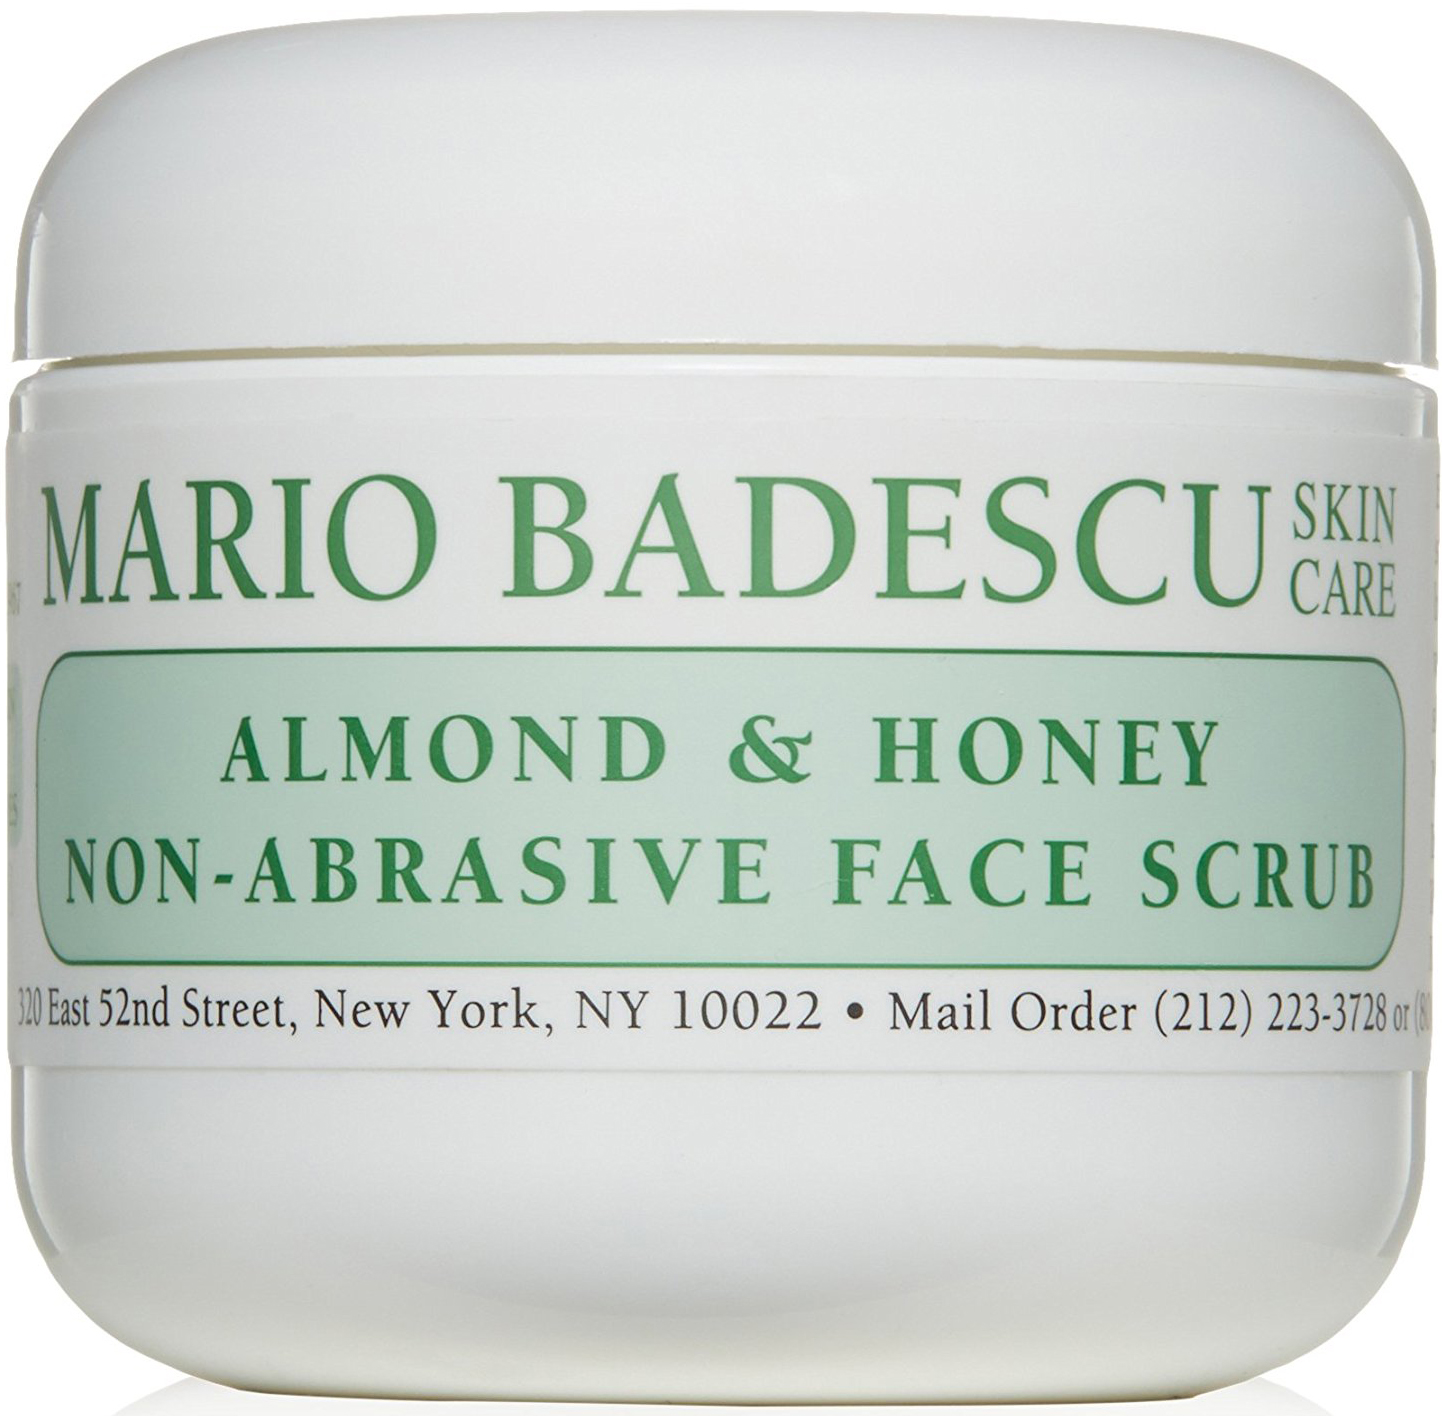 Mario Badescu Almond & Honey Non – Abrasive Face Srub Απολεπιστικό Srub Προσώπου για το Ξηρό – Αφυδατωμένο Δέρμα 118ml